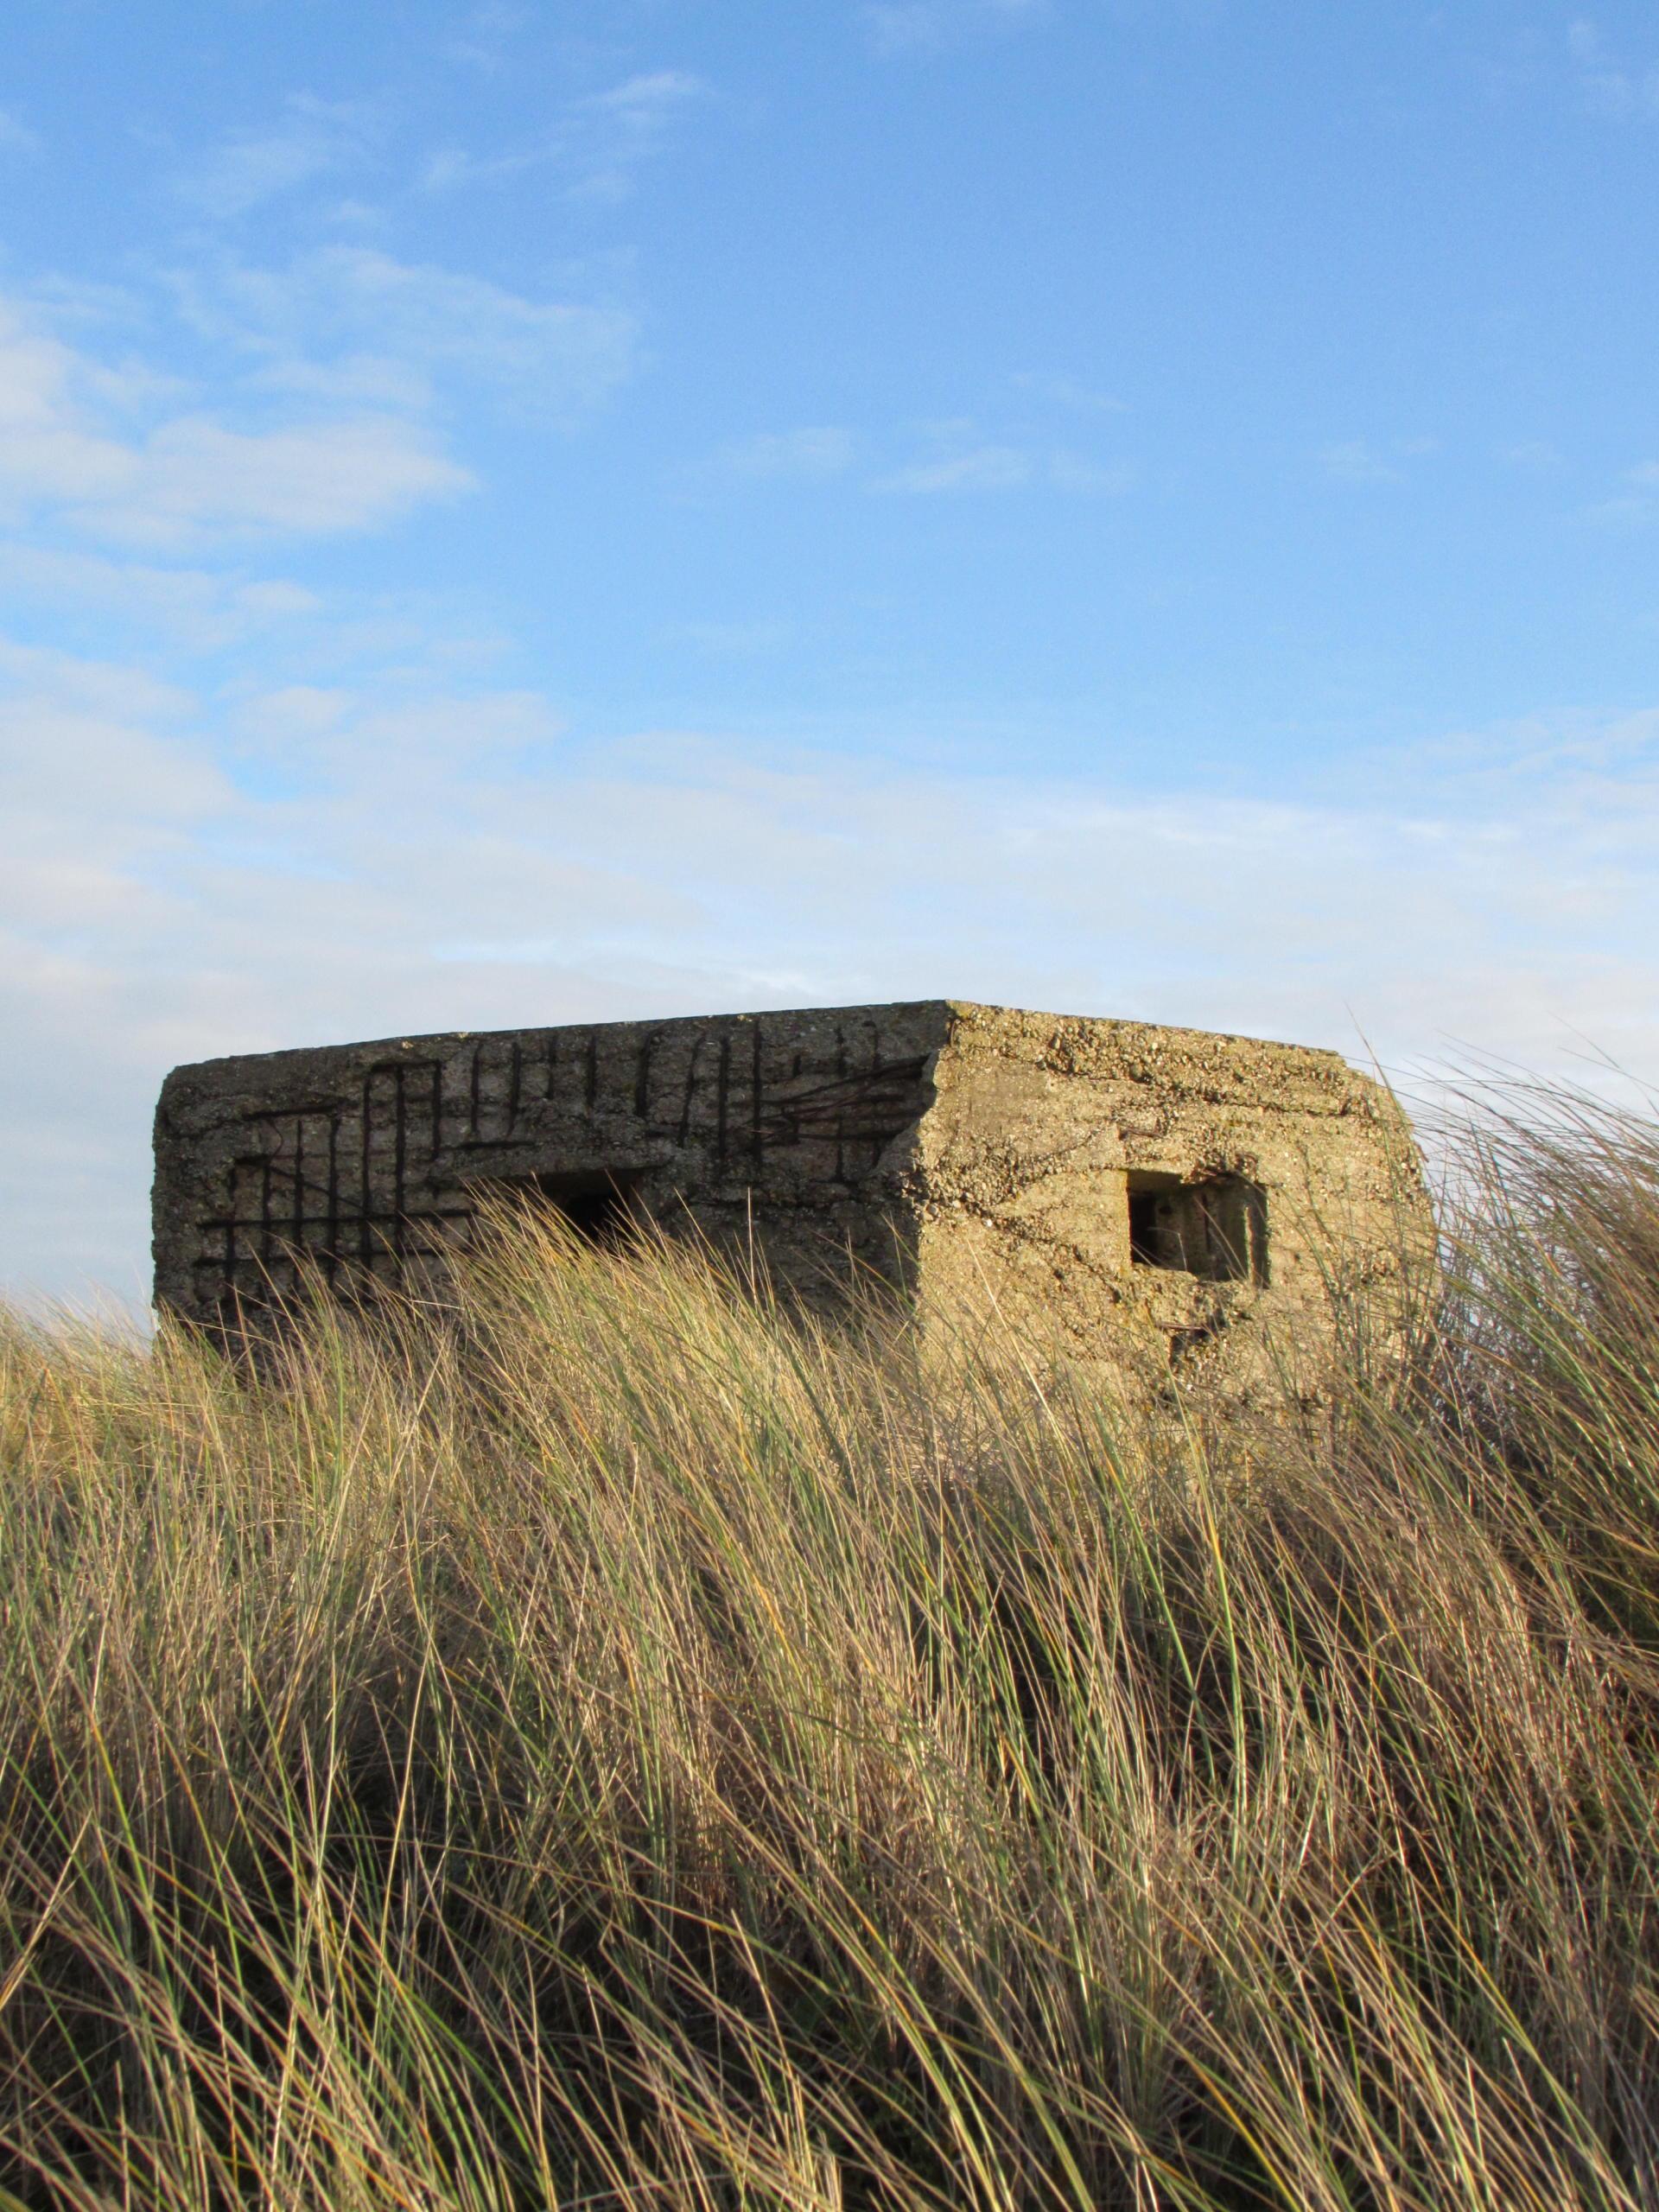 Seal Watching in North Norfolk - Yesihaveablog   World War II Pillbox Horsey   WW2   Norfolk - Life in a Fine City   Winterlust